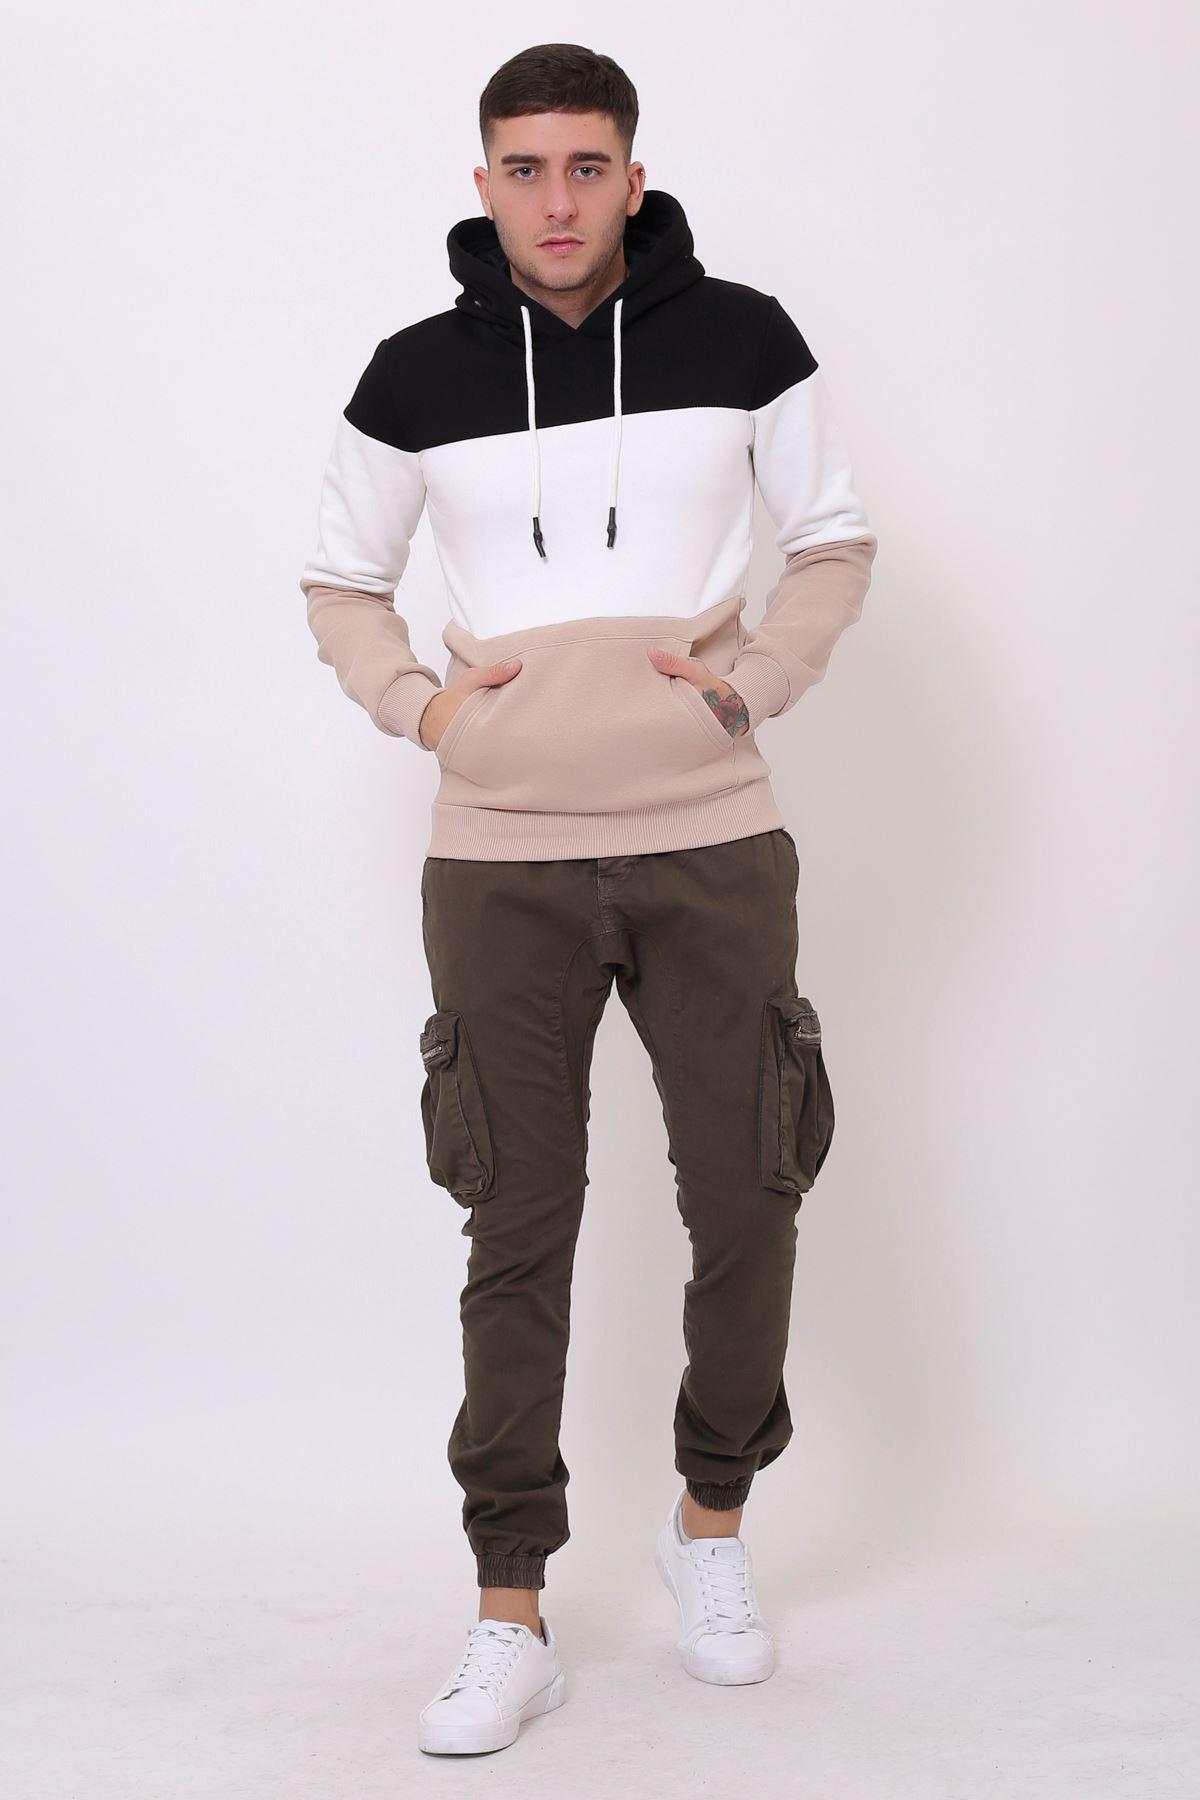 Kahve Erkek Üç Renk Panelli  Kapüşonlu Kanguru Cepli  Sweatshirt